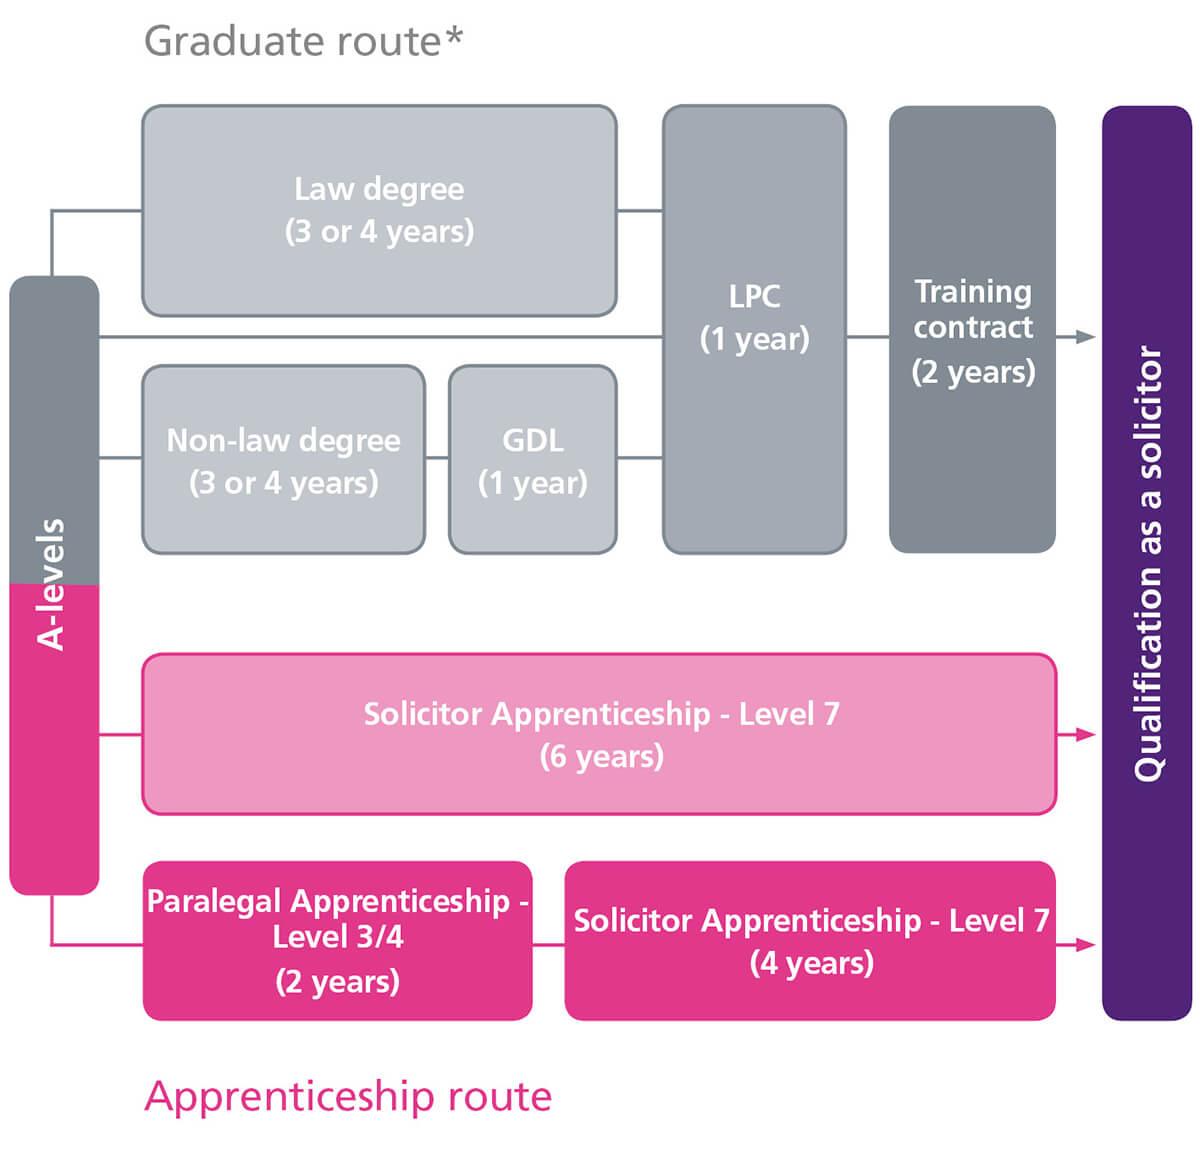 Graduate and apprentice routes